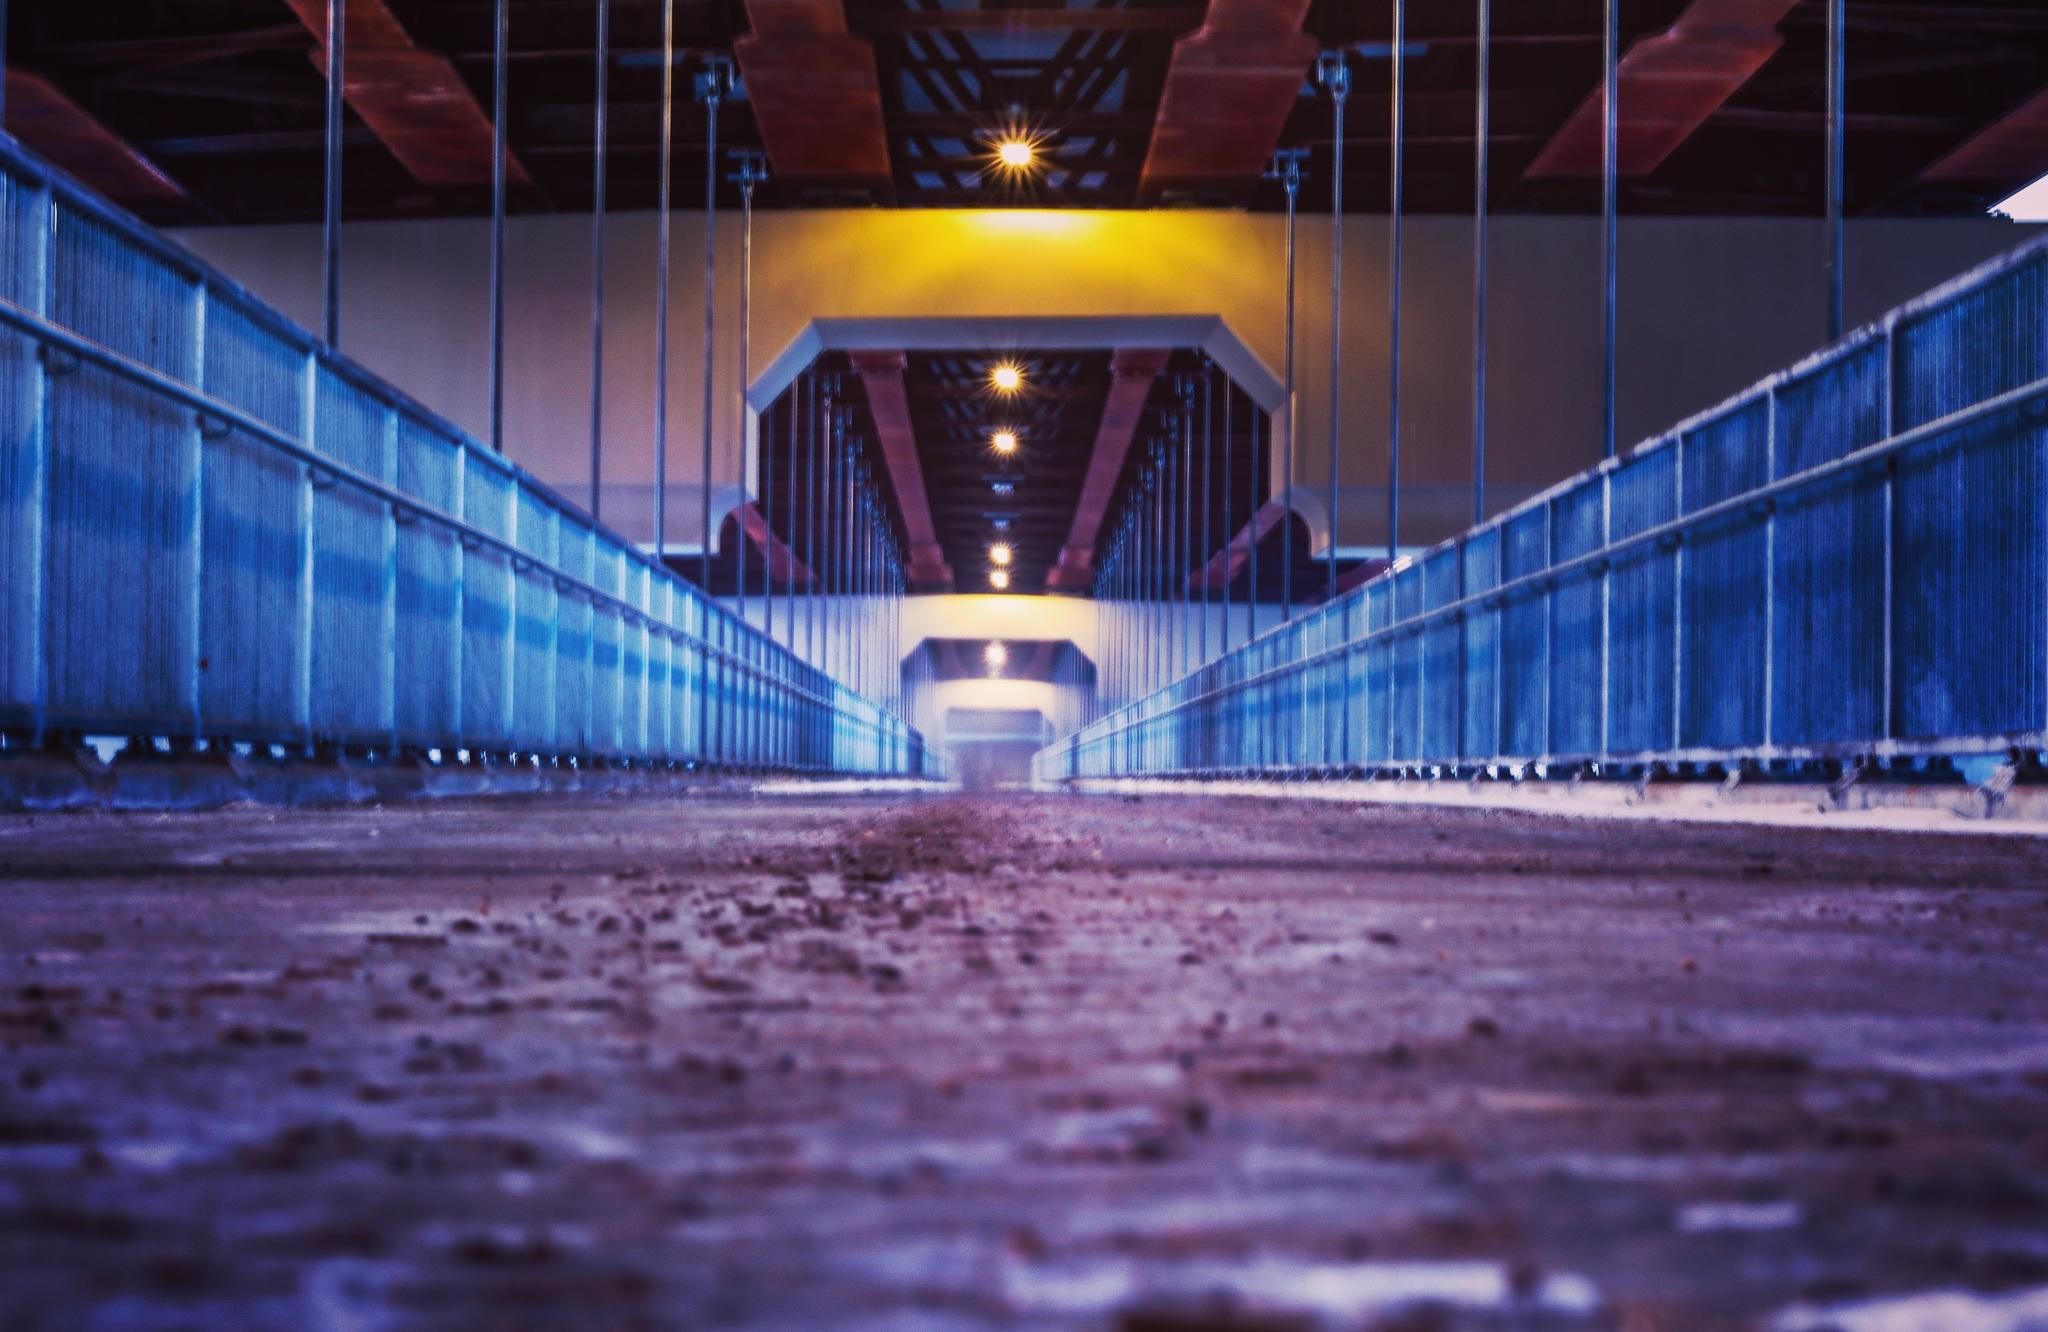 crossing bridges  by leif schmitz